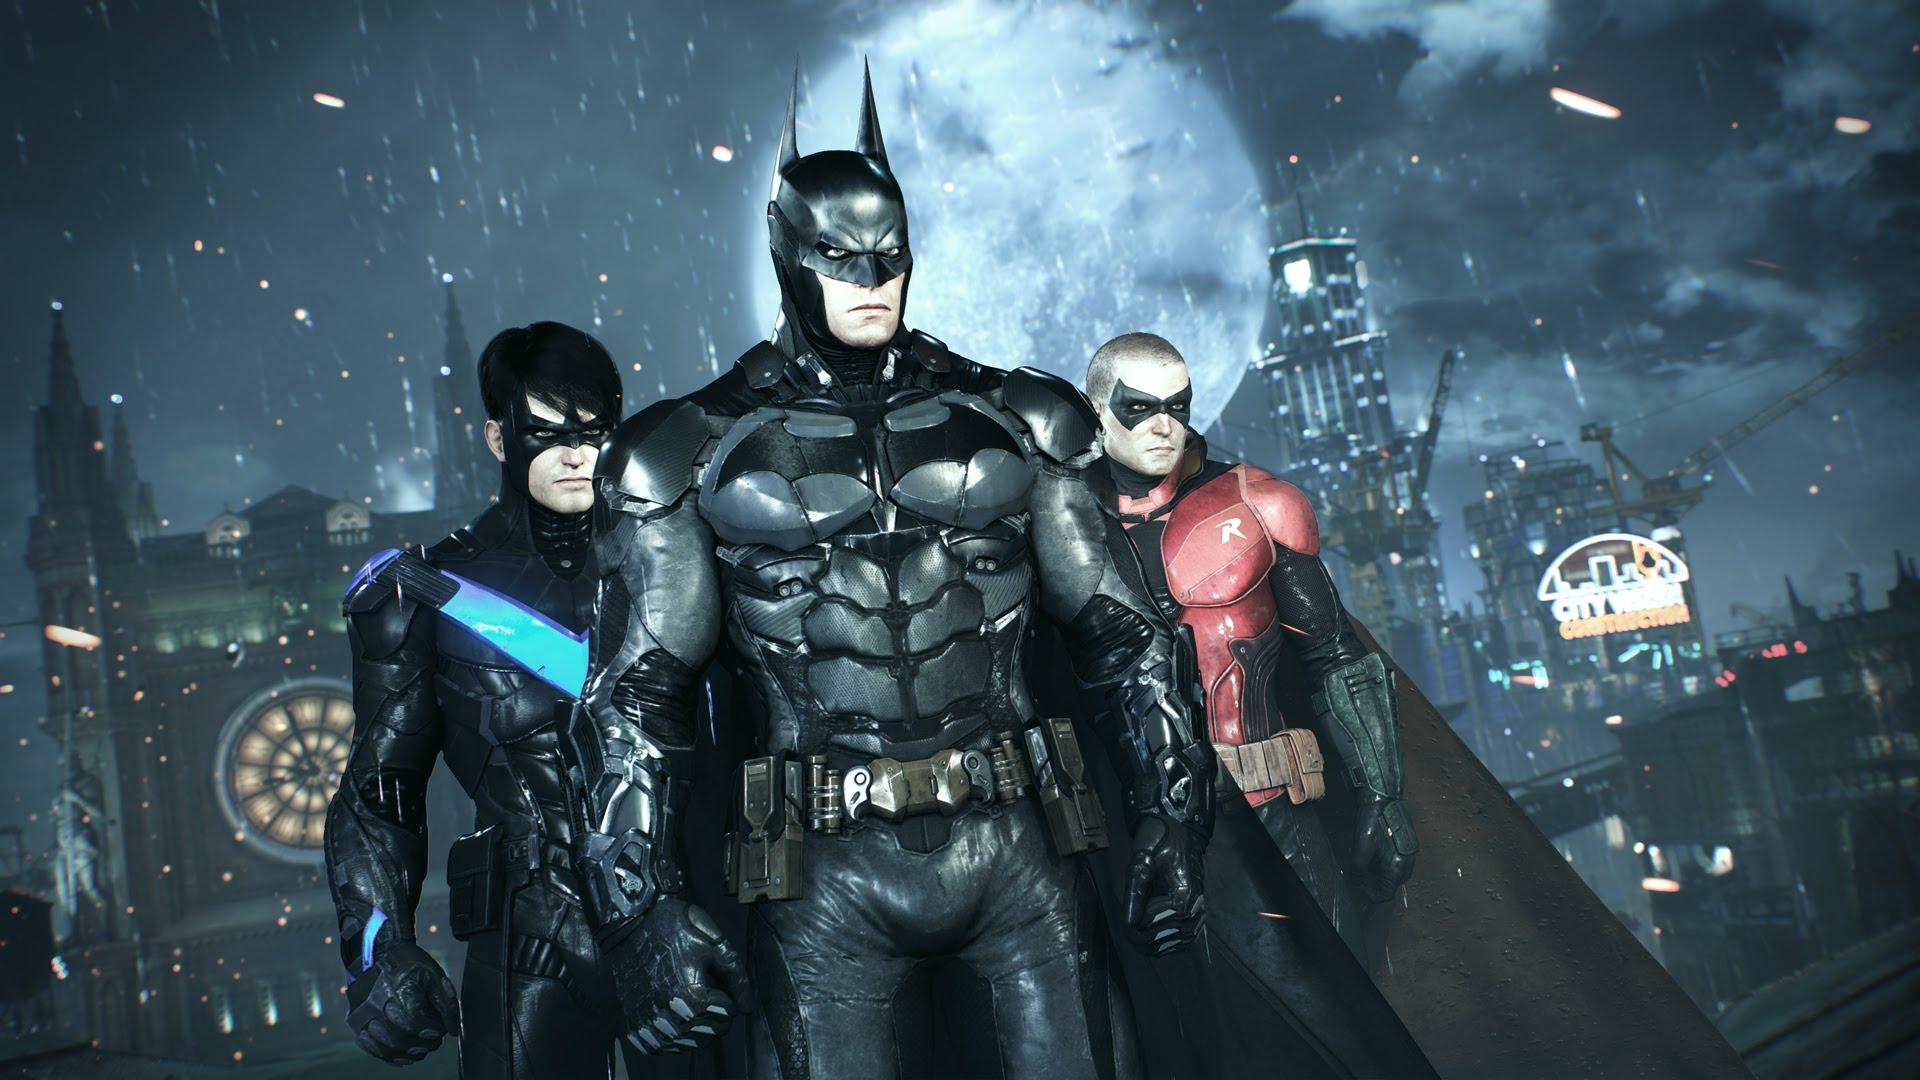 Batman: Arkham Knight Backgrounds on Wallpapers Vista